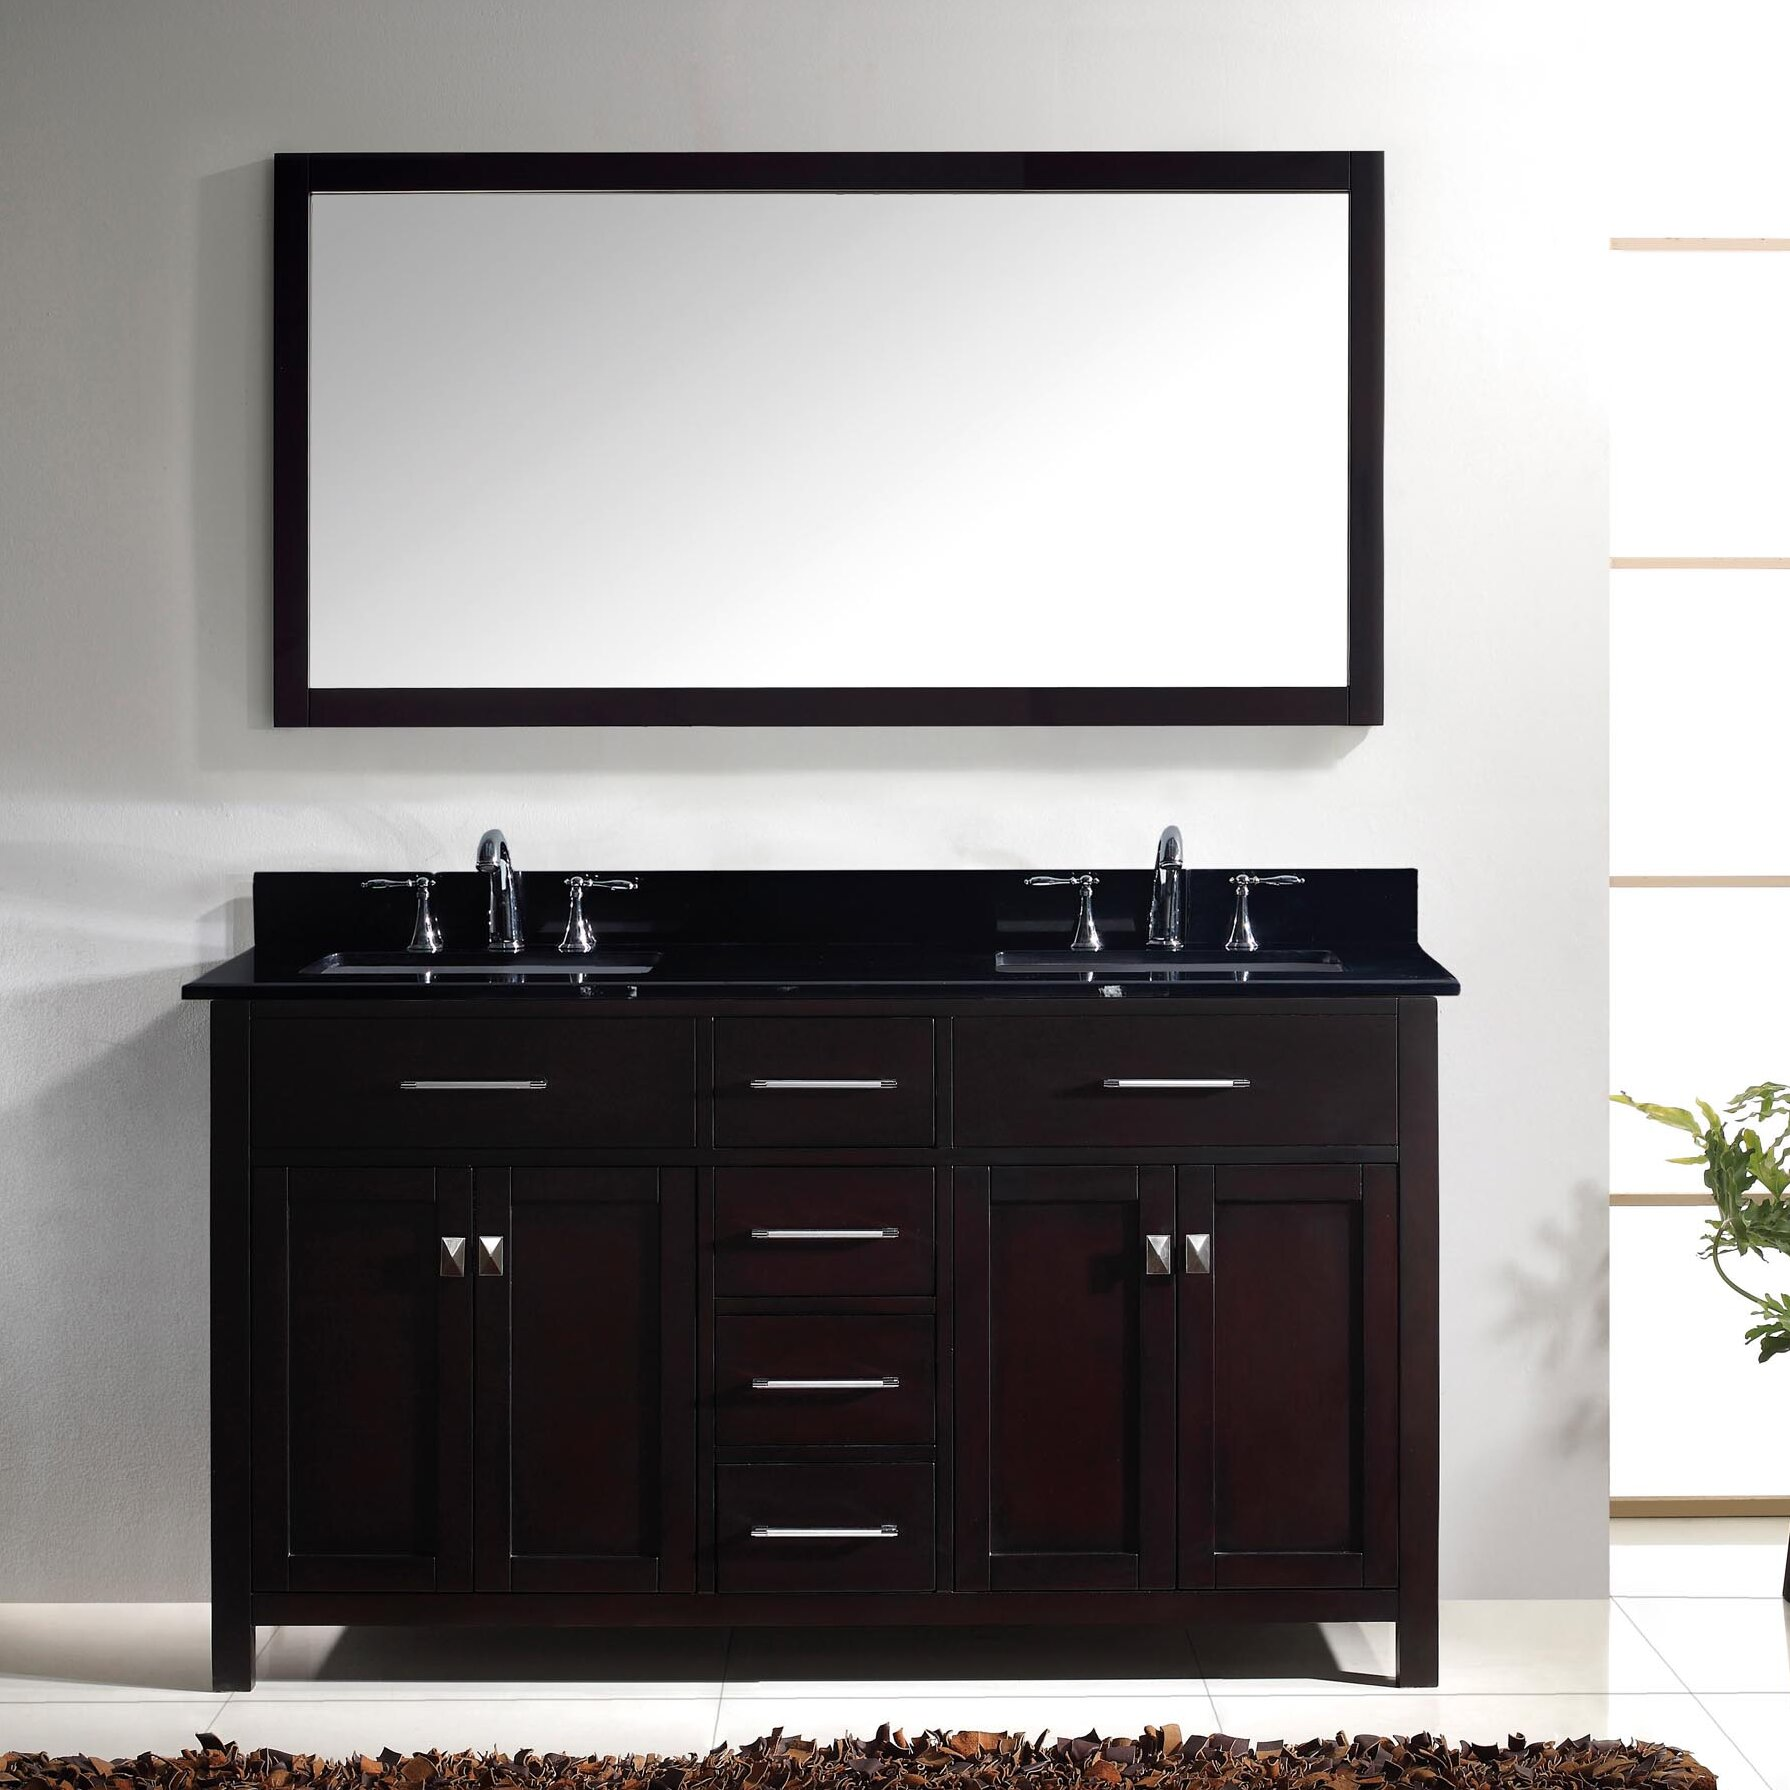 virtu caroline 60 double bathroom vanity set with black galaxy top